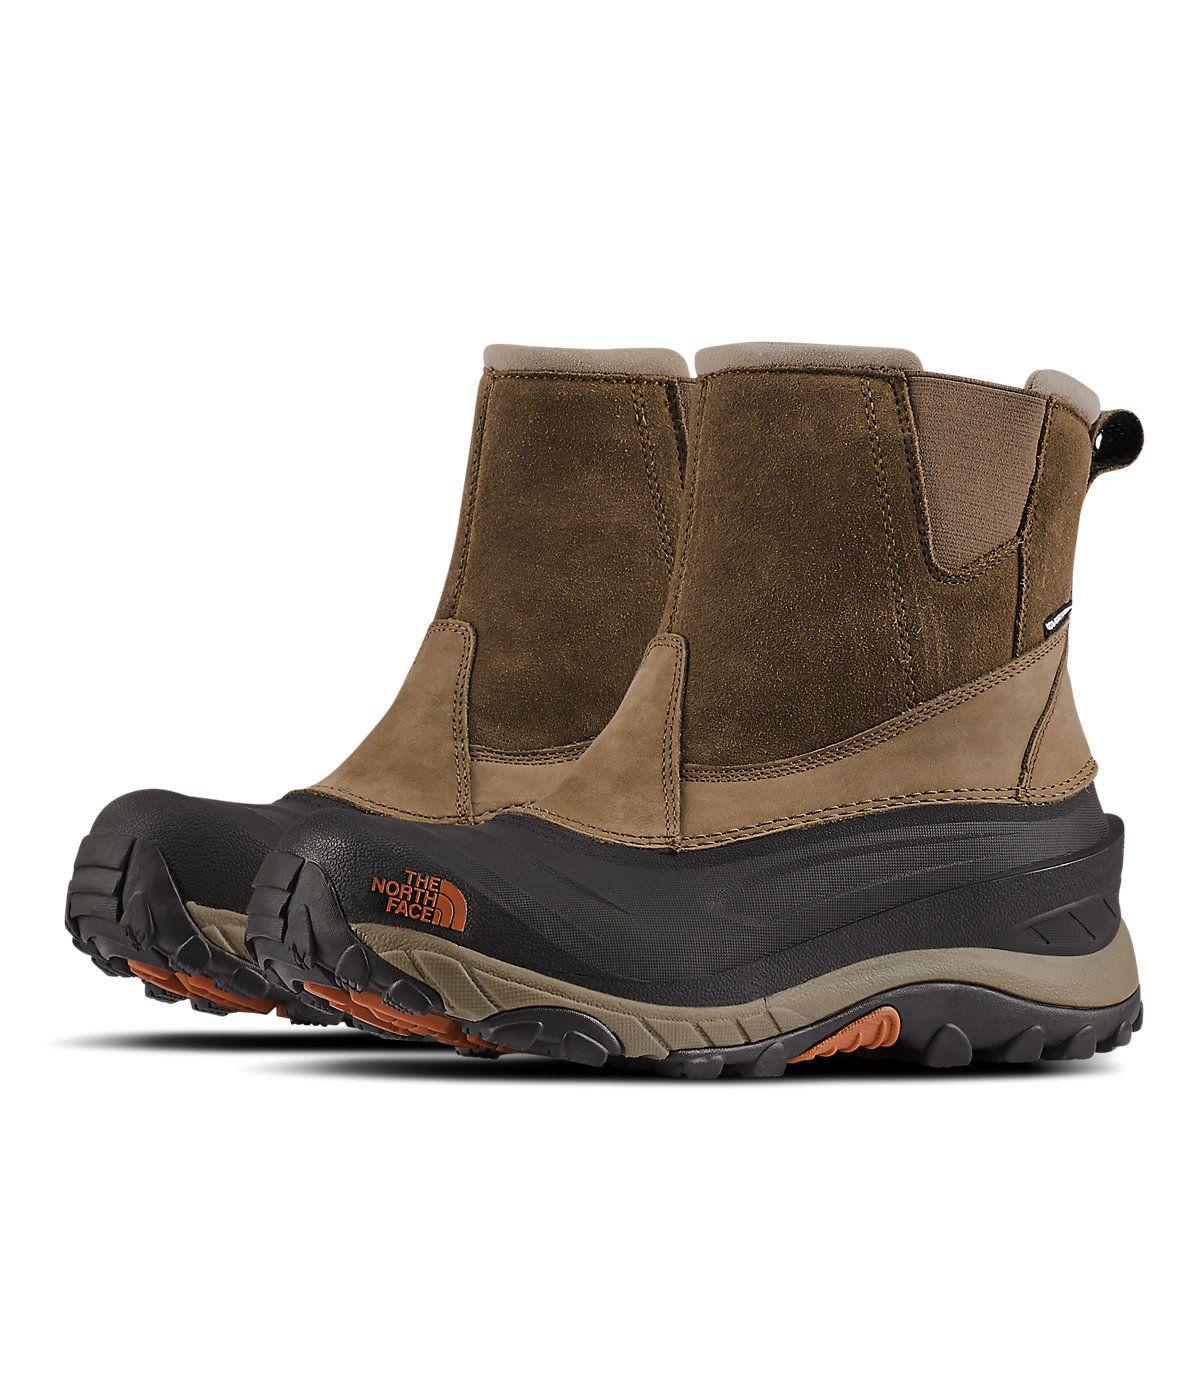 Men's Chilkat III Pull-On Winter Boots